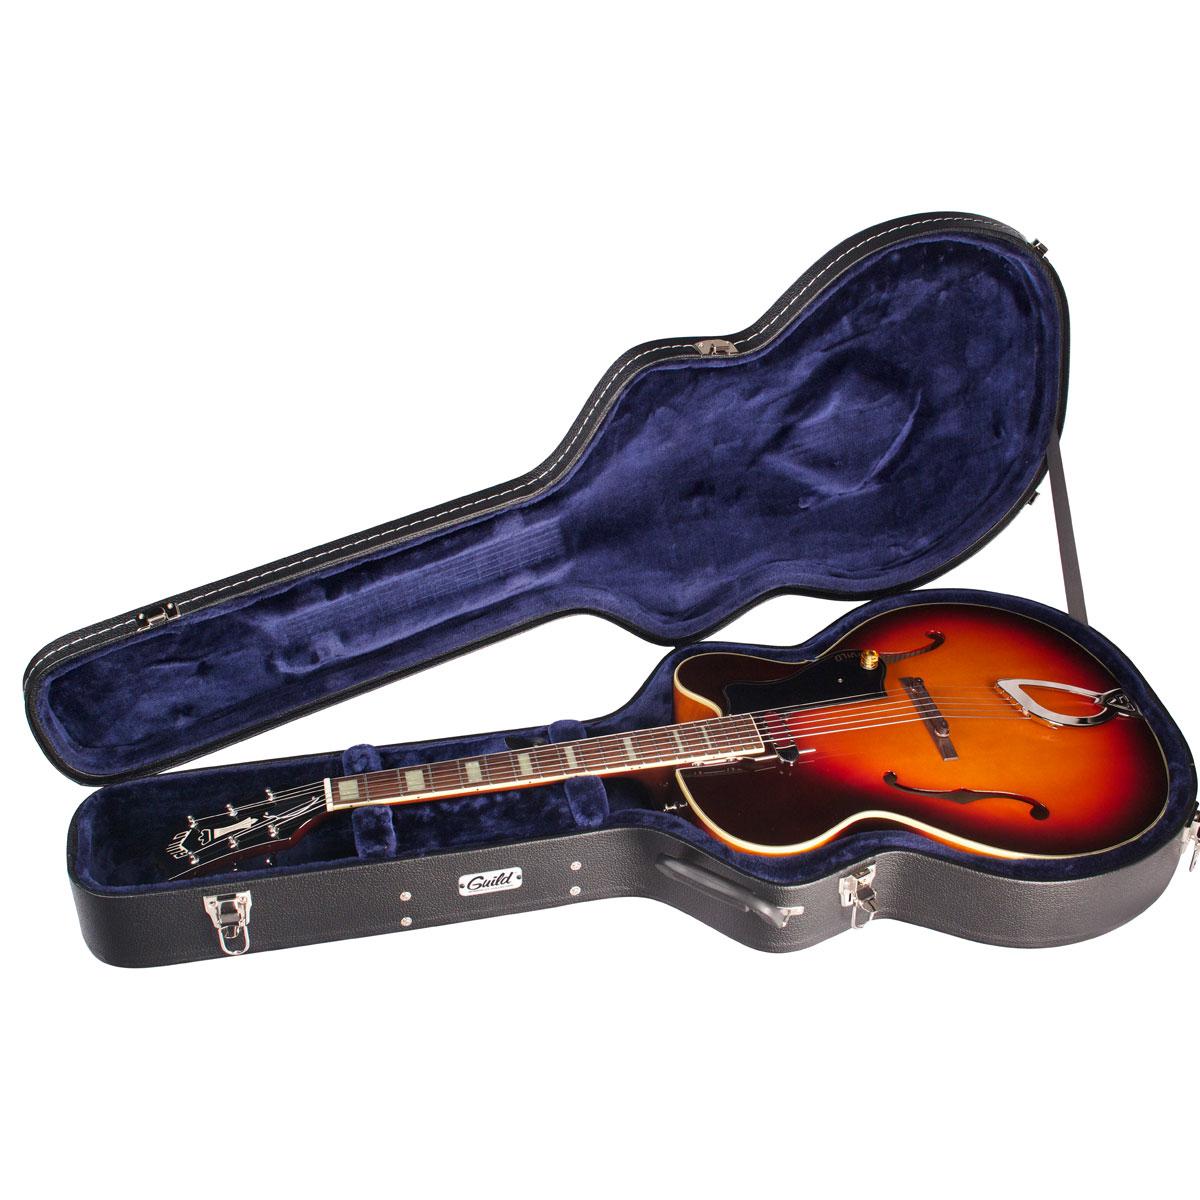 guild deluxe electric guitar wood case multiple sizes guild guitars. Black Bedroom Furniture Sets. Home Design Ideas